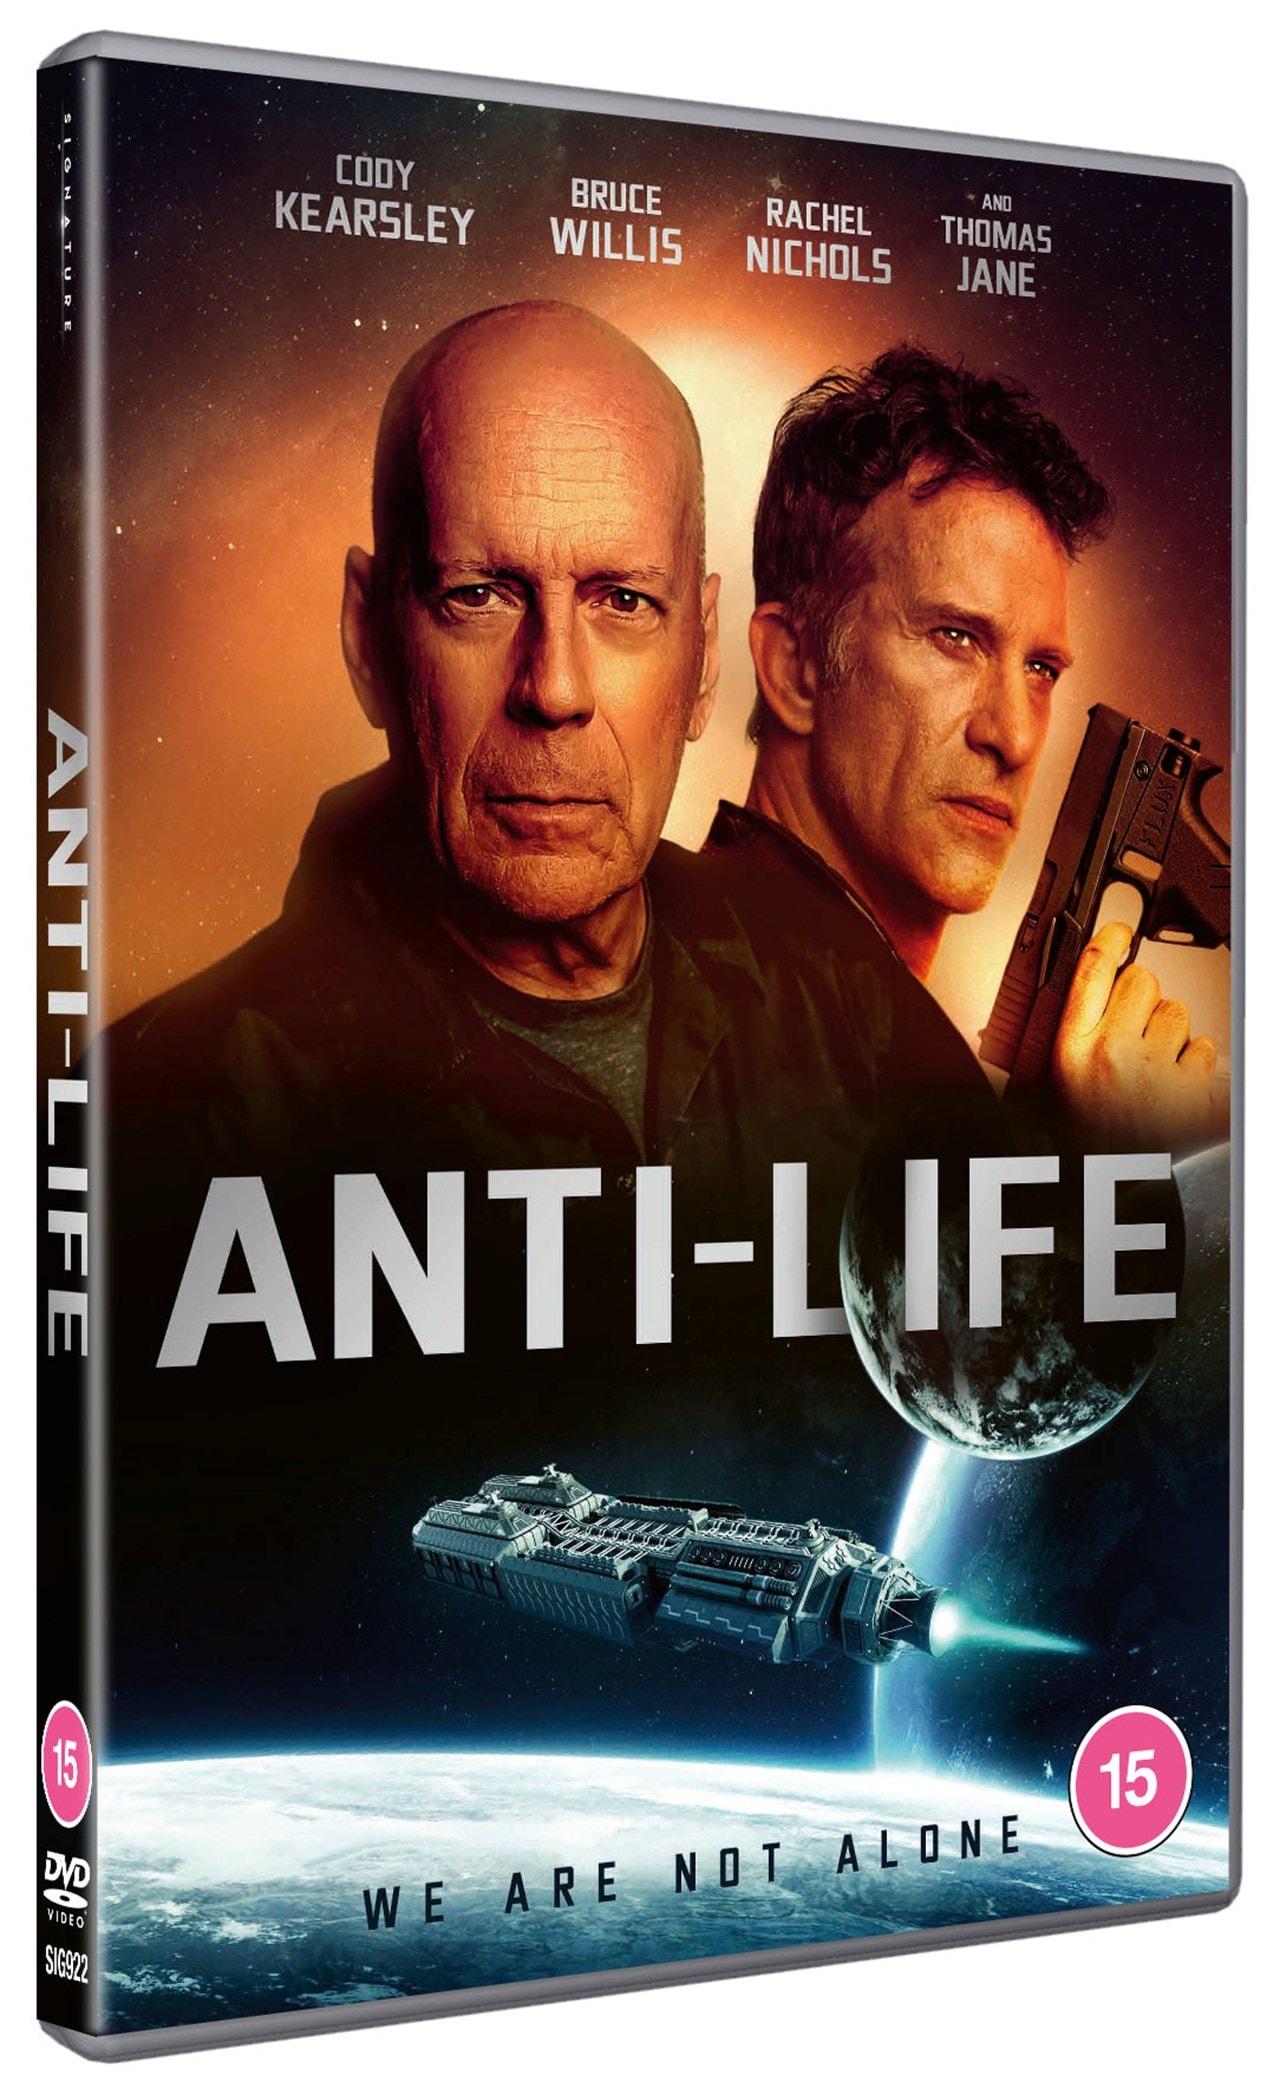 Anti-life - 2